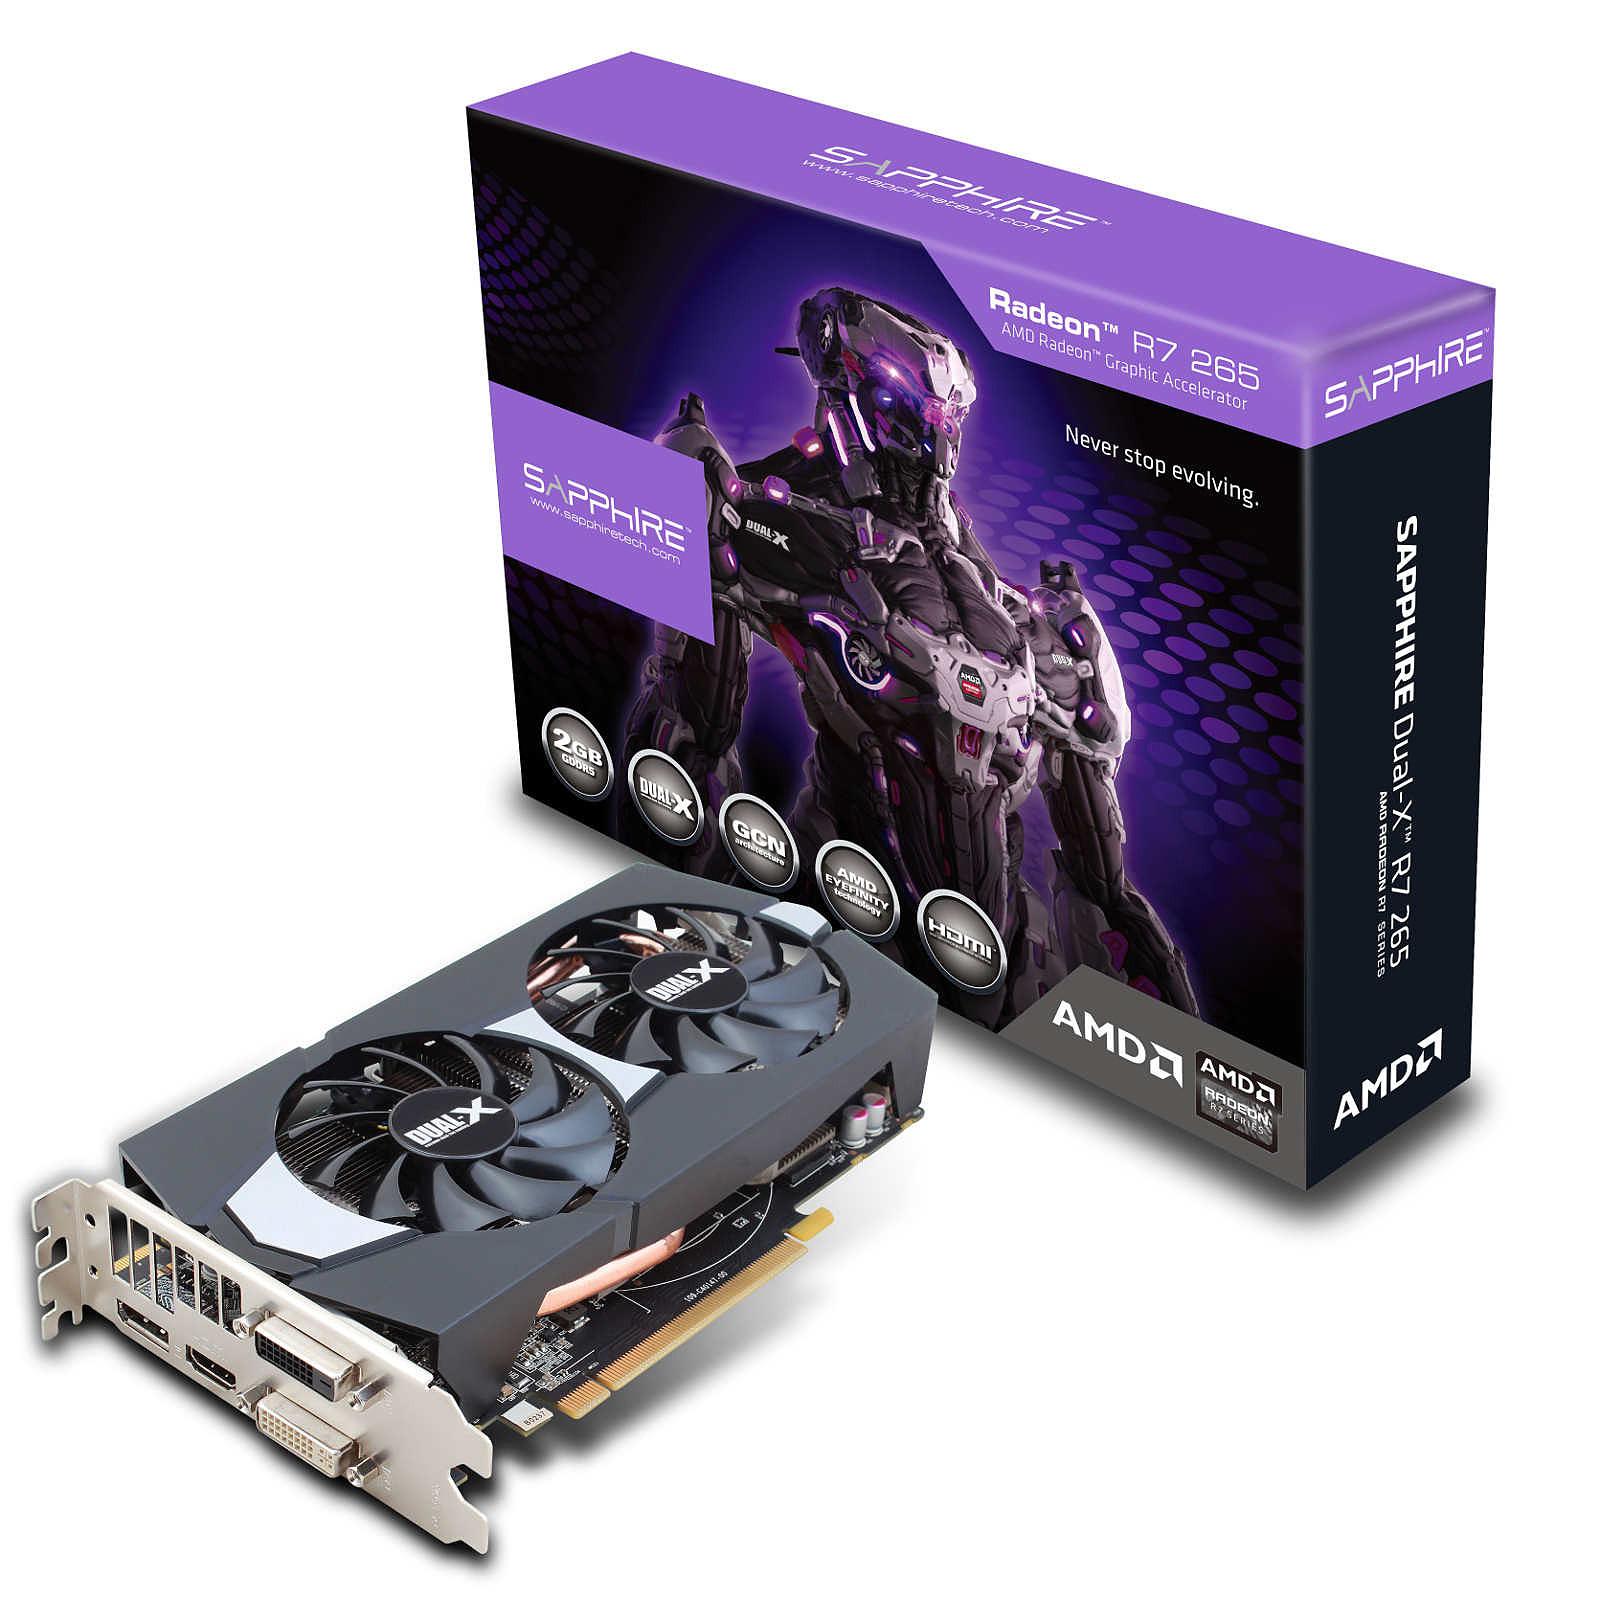 Sapphire Radeon R7 265 2G GDDR5 Dual-X